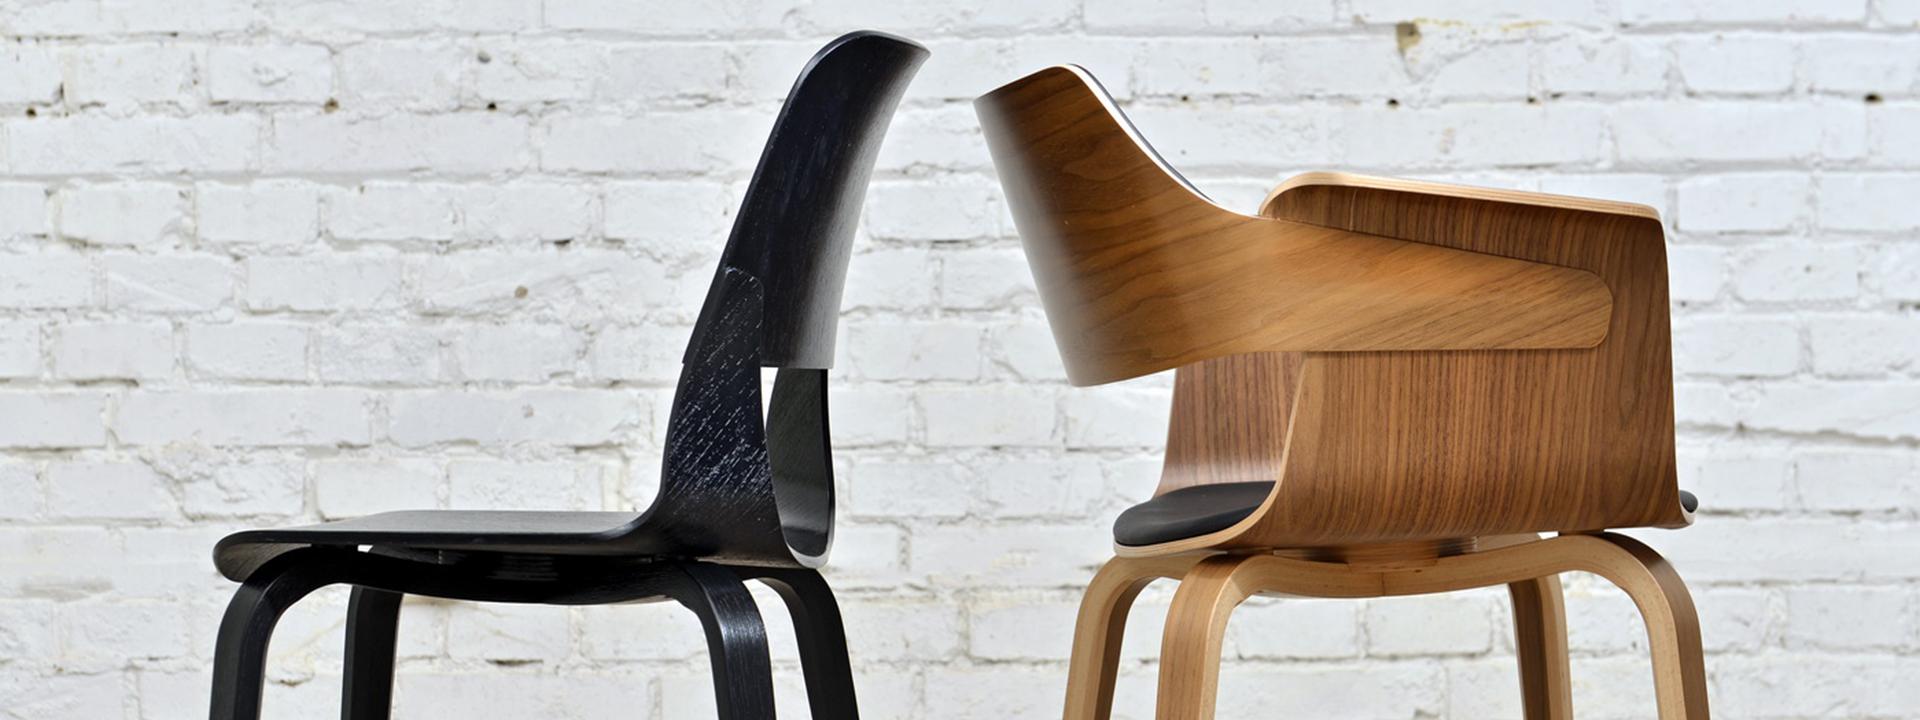 Products designed by Andras Kerekgyarto